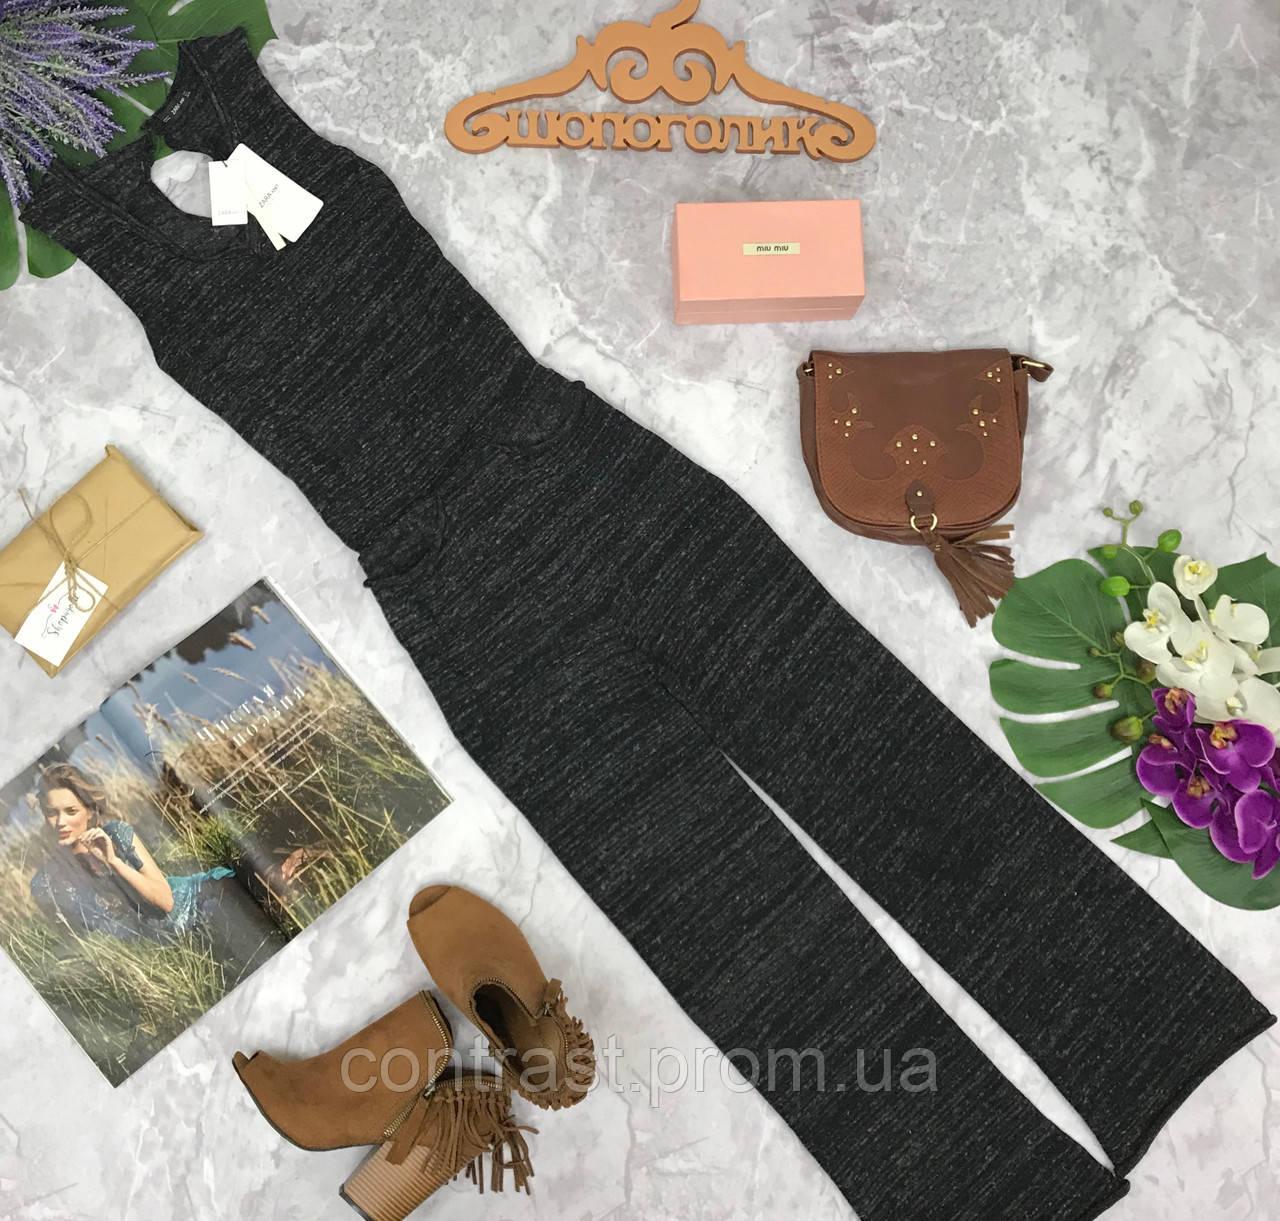 Трикотажный комбинезон Zara  OV1804128